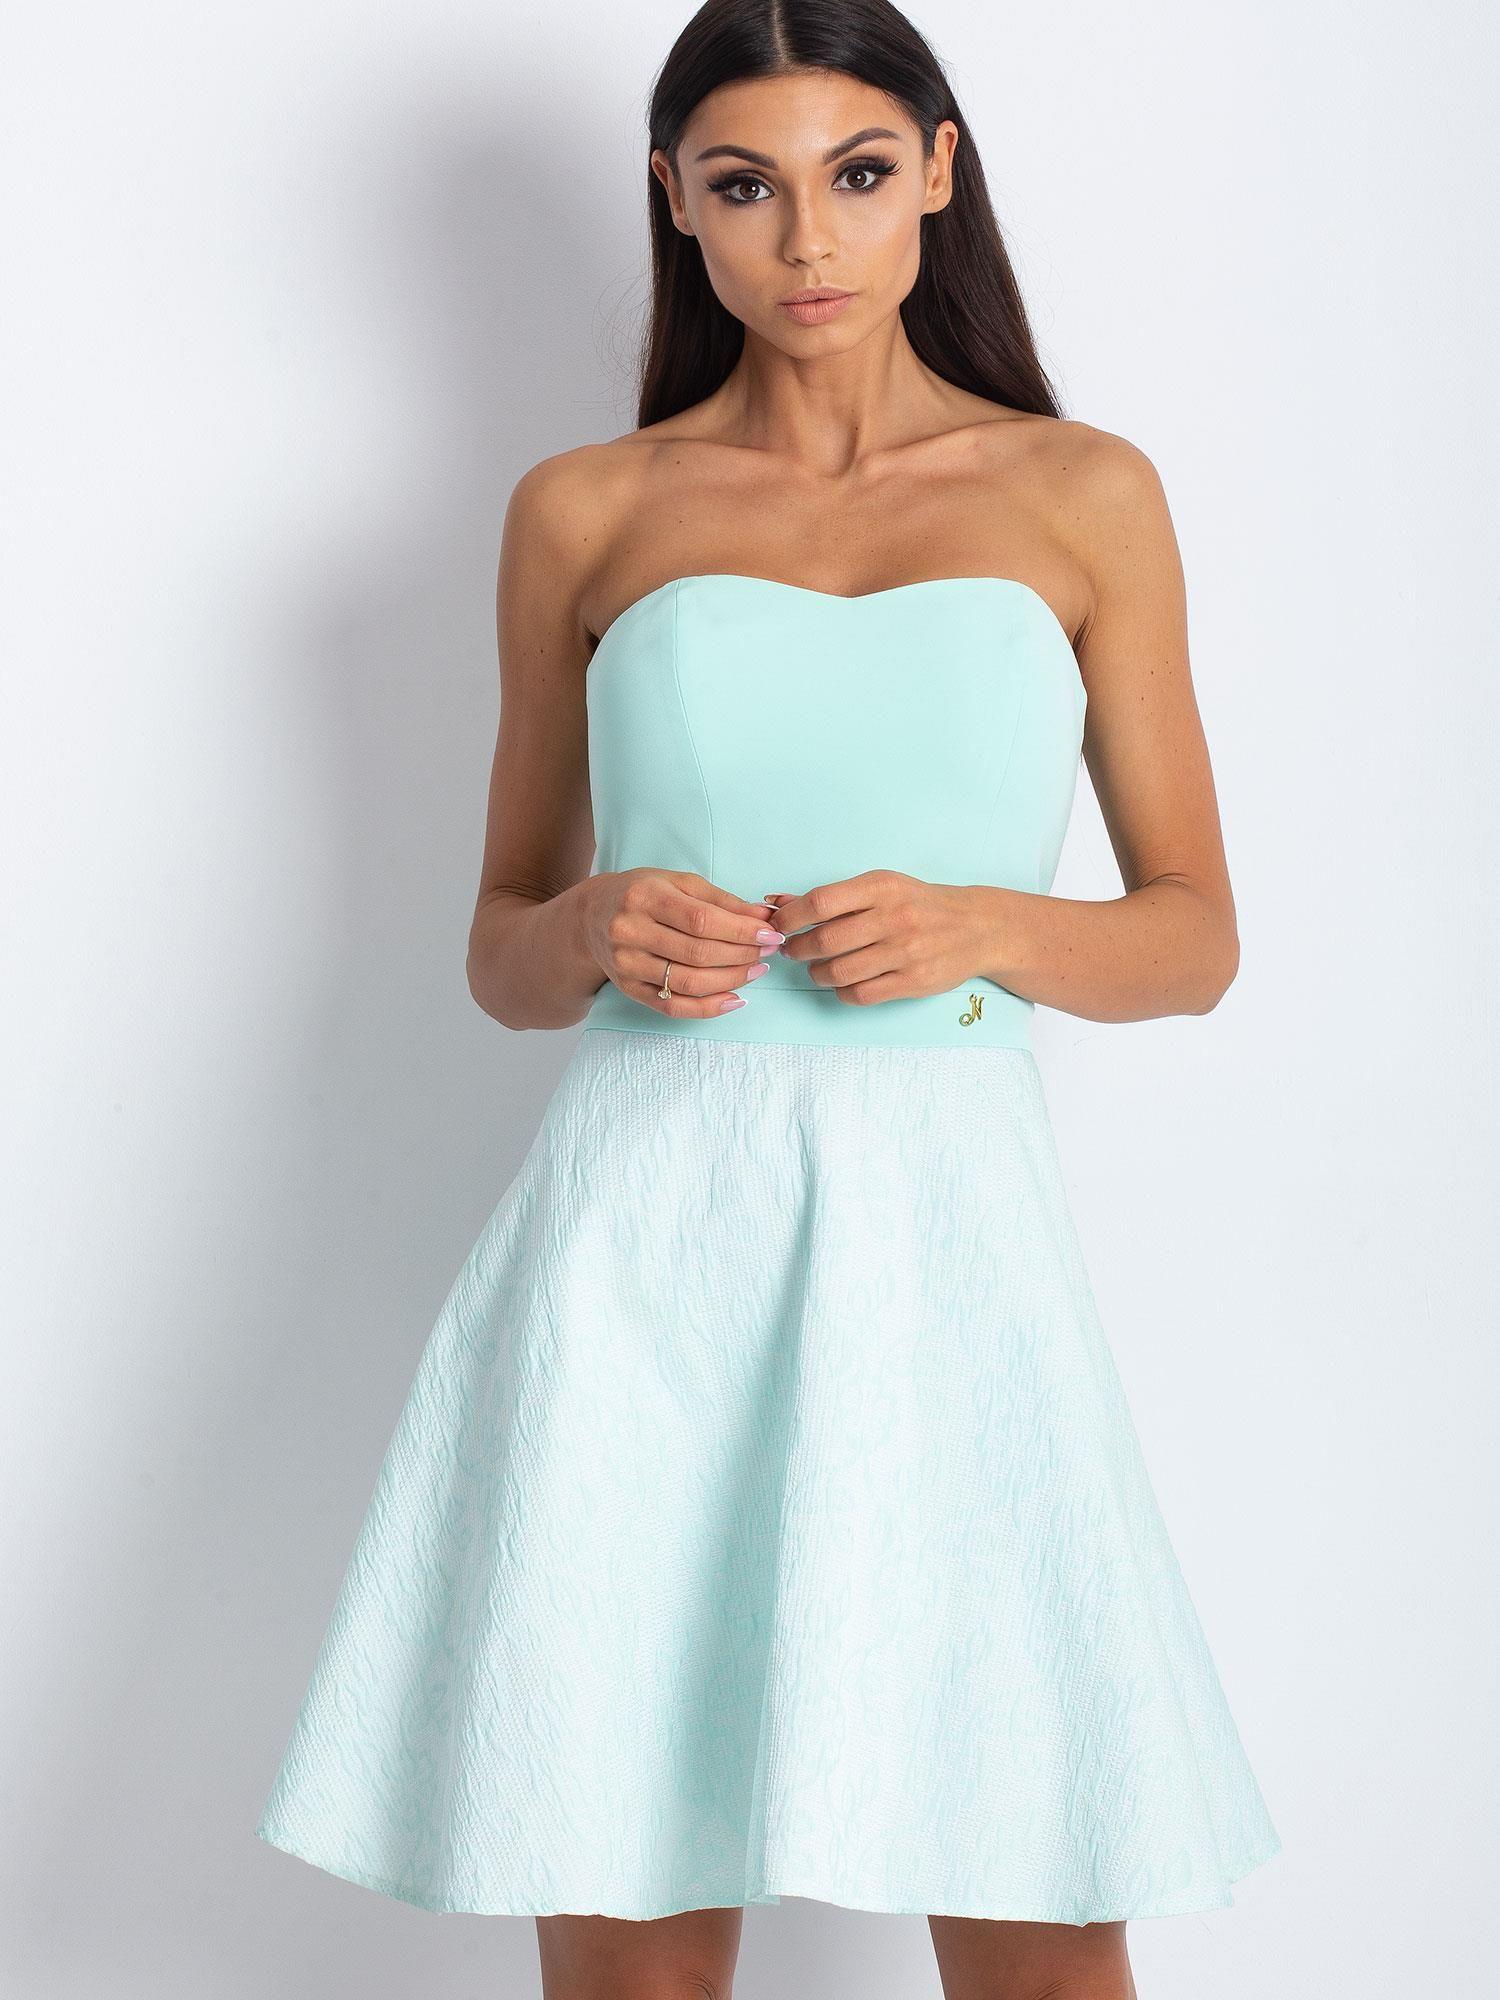 d4de5e87e0 Miętowa rozkloszowana sukienka bez ramiączek - Sukienka koktajlowa ...